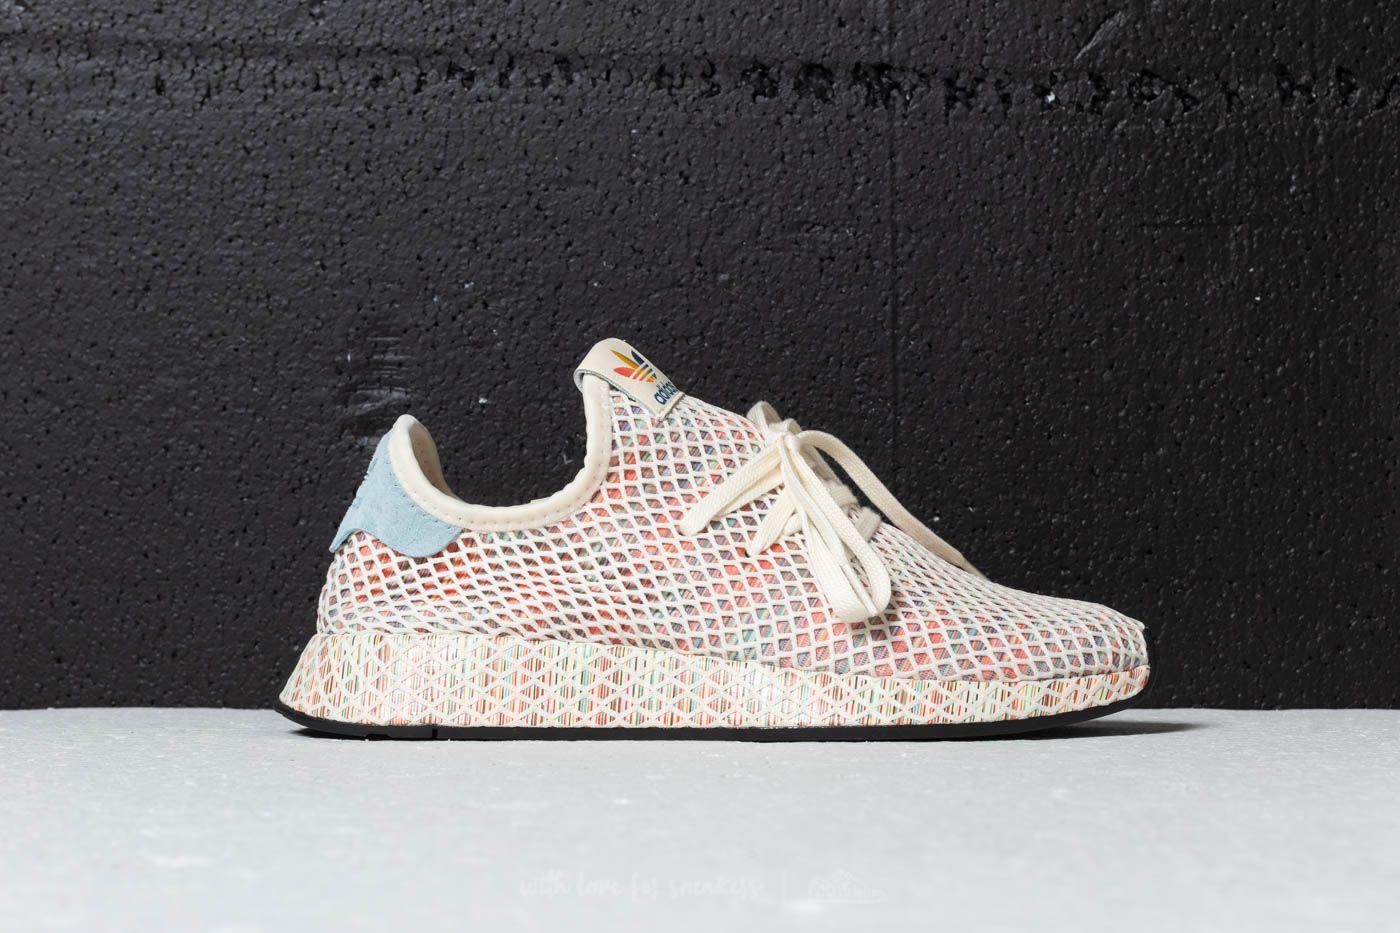 lowest price 512a5 ebd66 Lyst - adidas Originals Adidas Deerupt Pride Cream White Ash